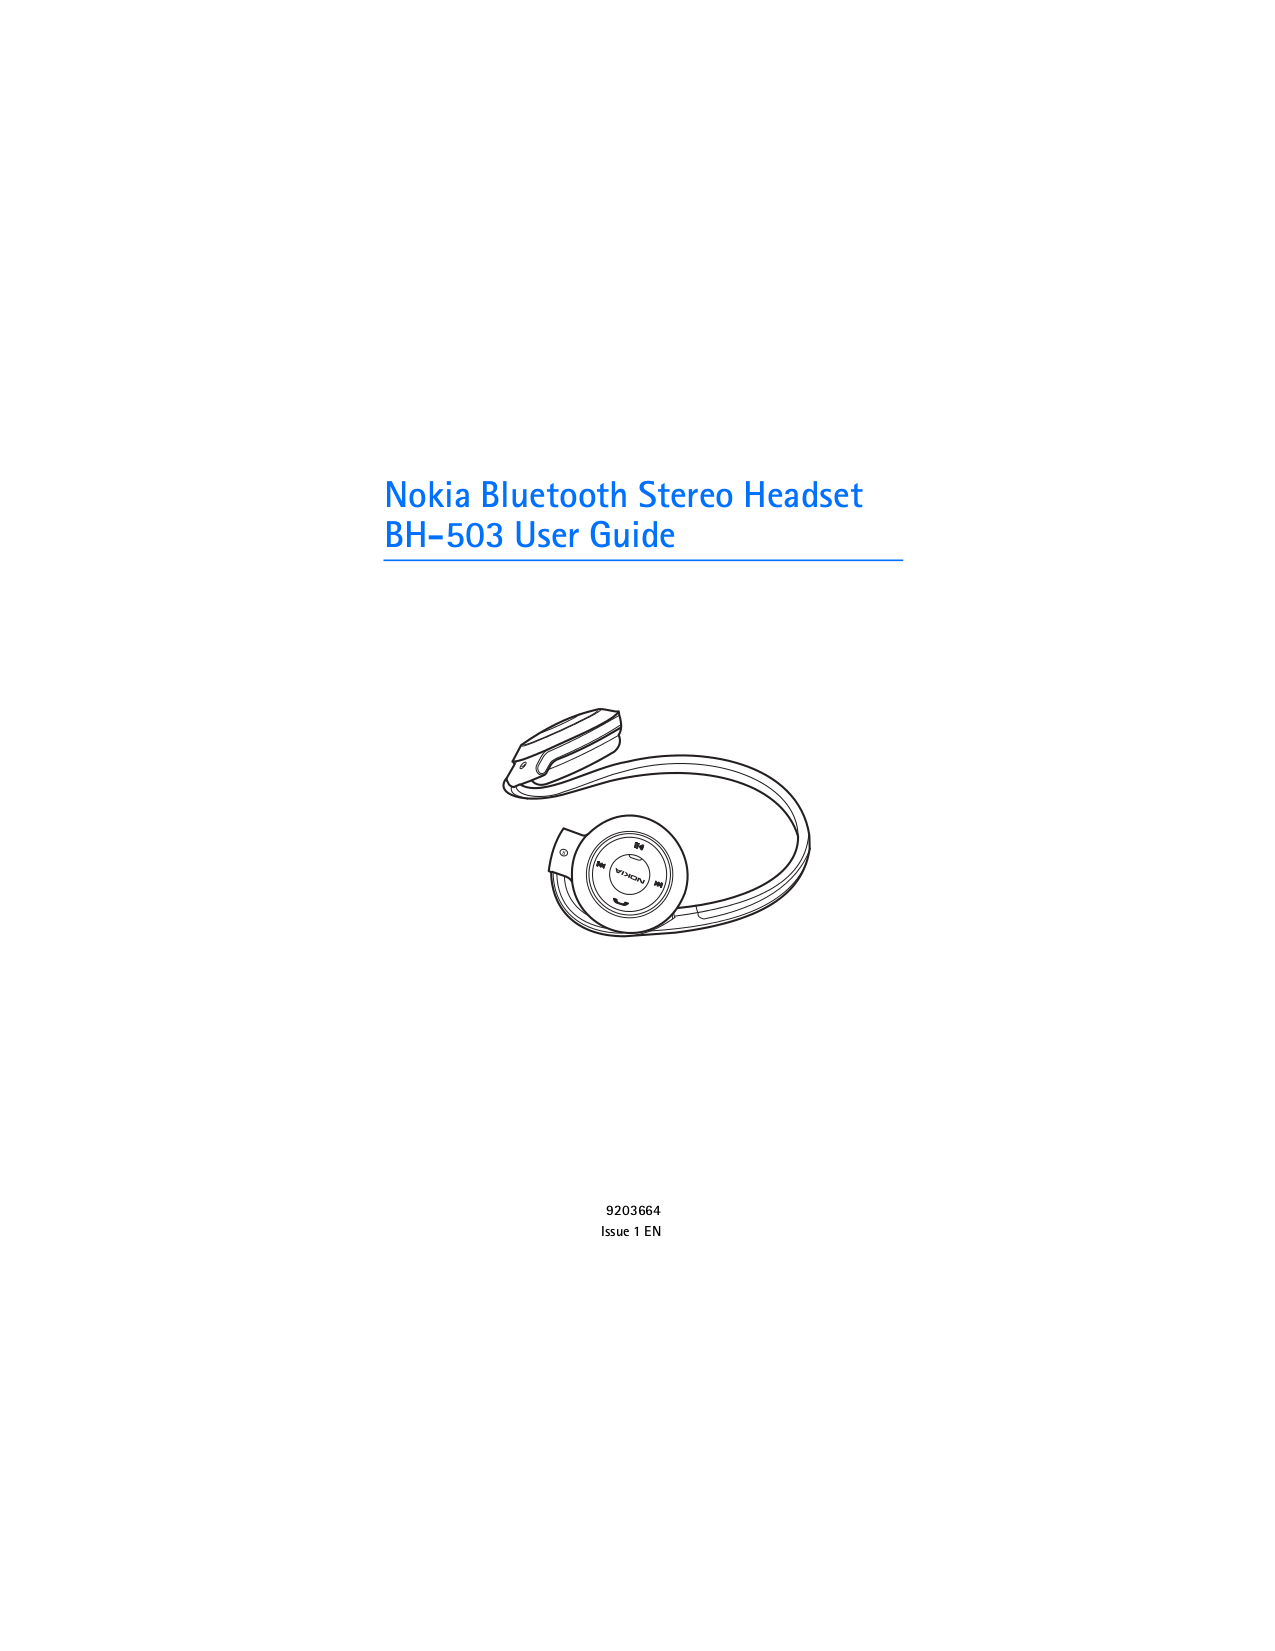 pdf for Nokia Headset BH-503 manual